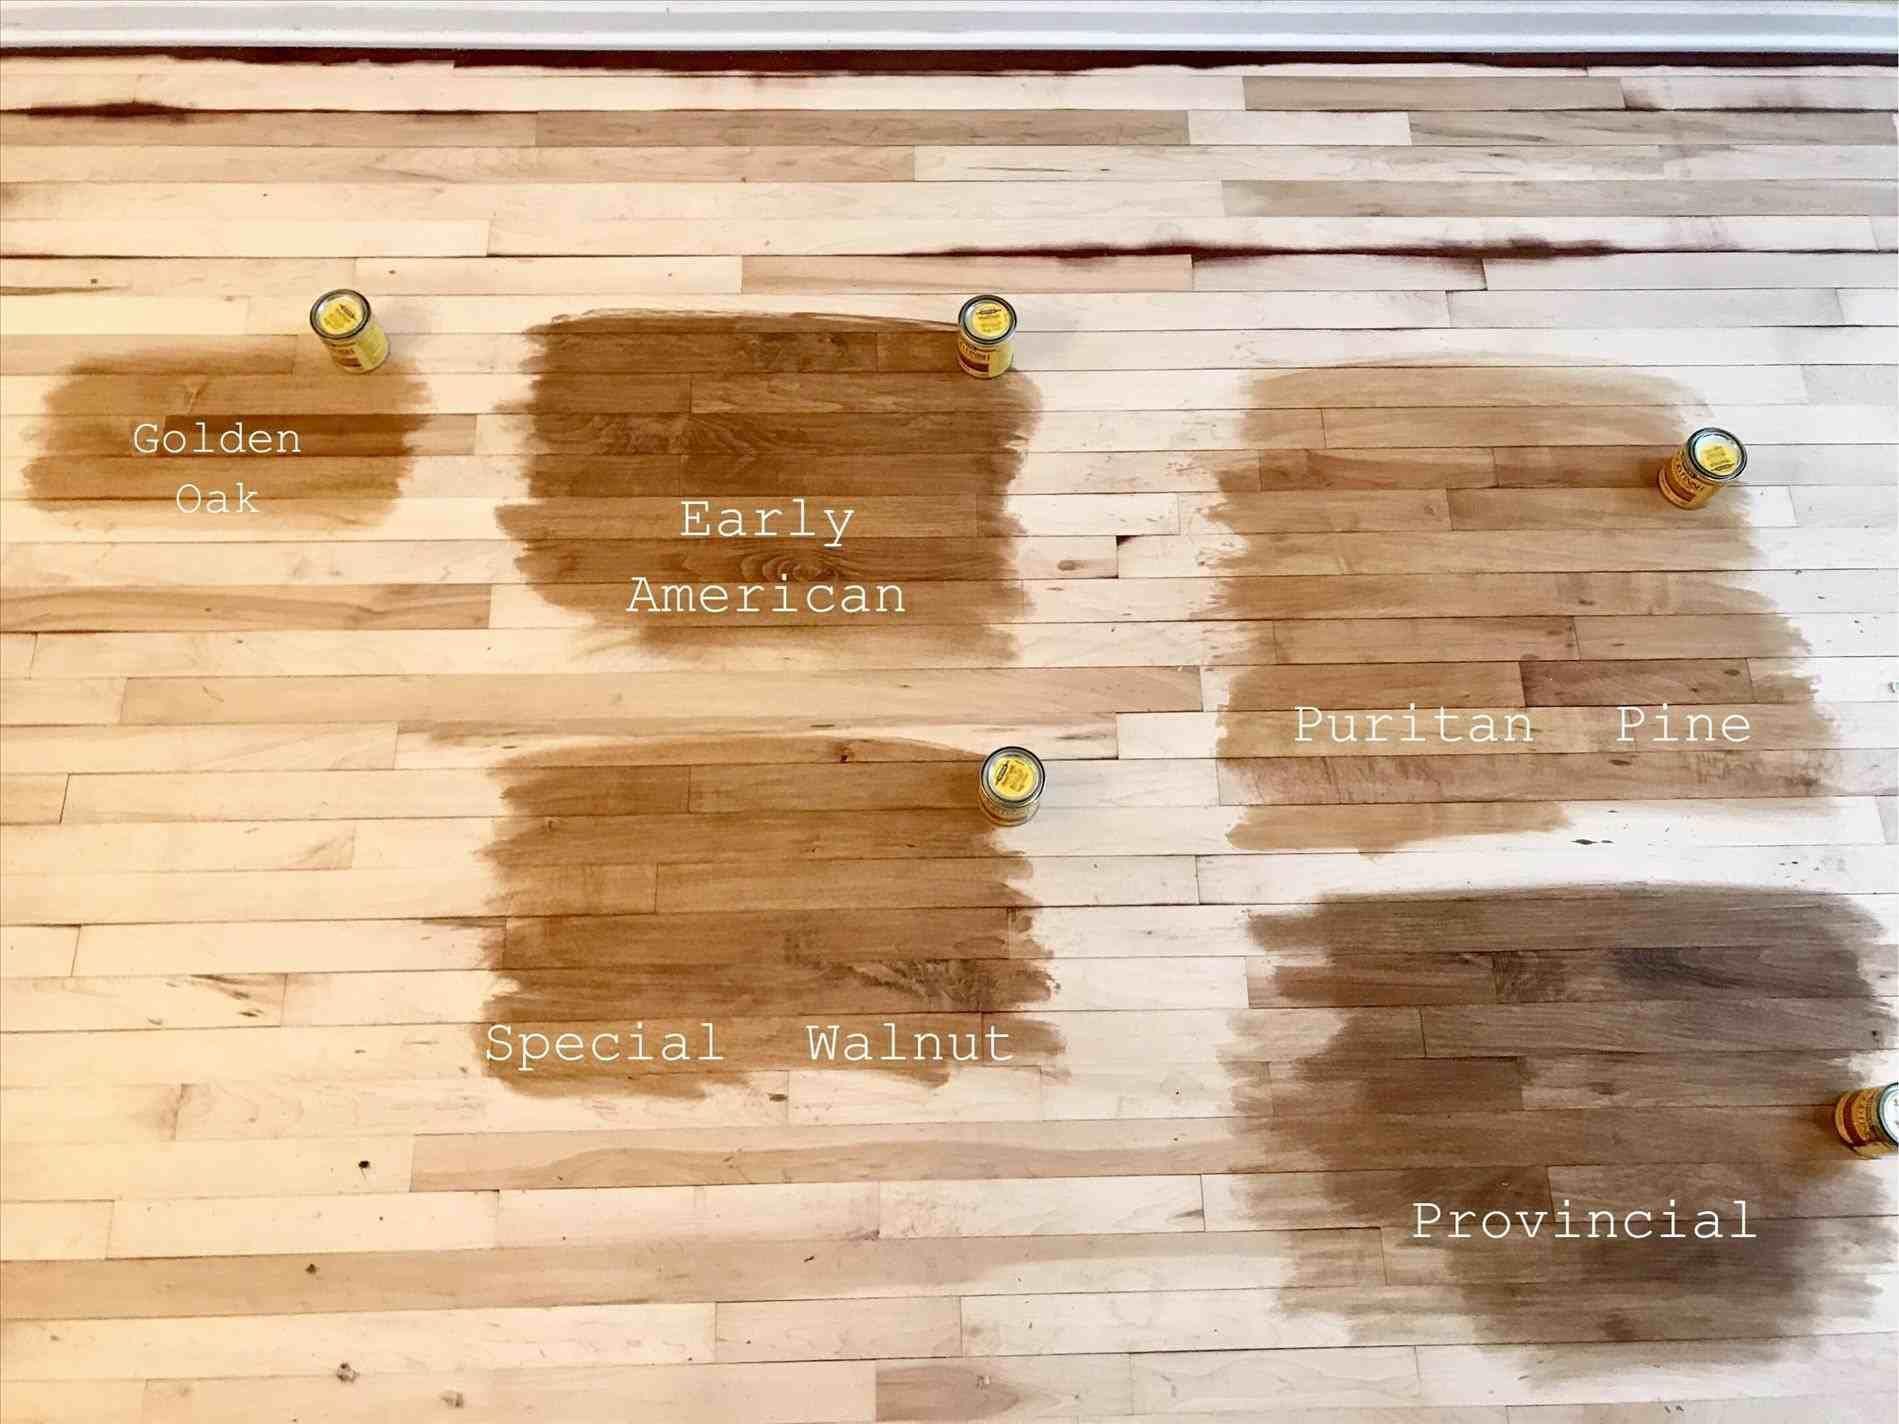 All Duraseal Dark Walnut Special Rhpinterestcom Minwax Stains On Sanded Birch Hardwood Fl Diy Hardwood Floors Hardwood Floor Stain Colors Birch Hardwood Floors